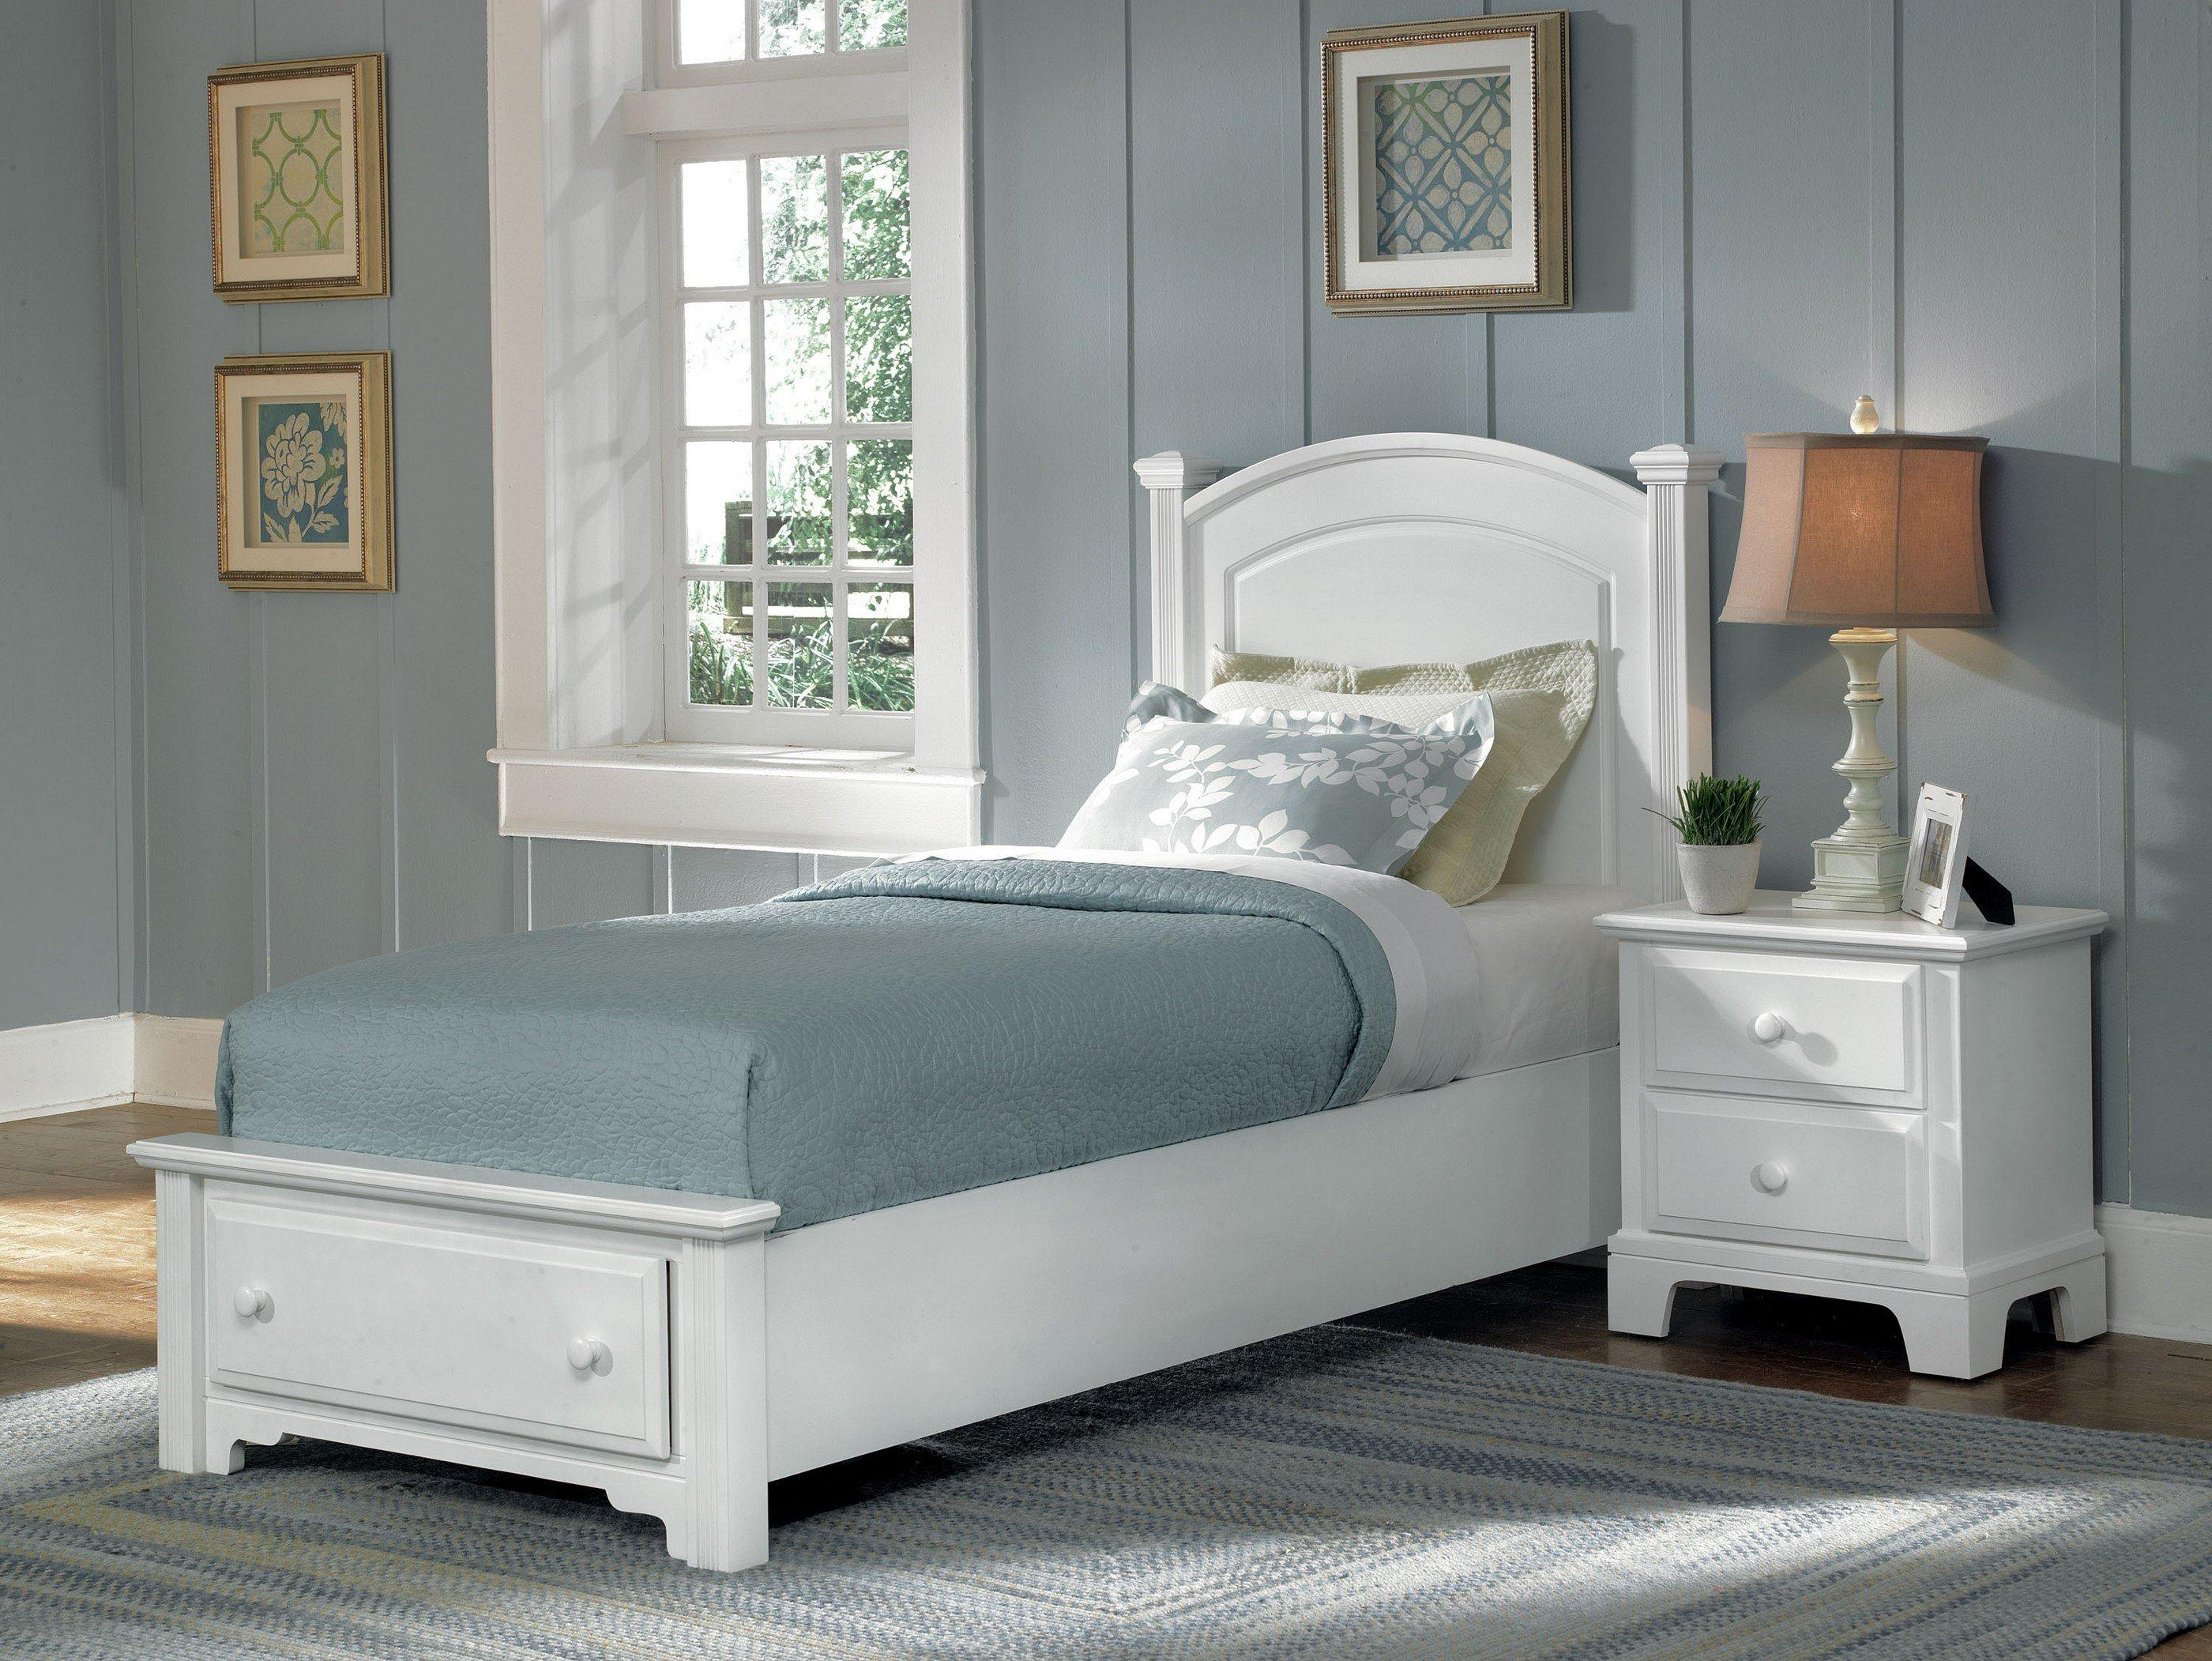 Vaughan Bassett Hamilton/Franklin Twin Panel Bed | Wayside Furniture ...